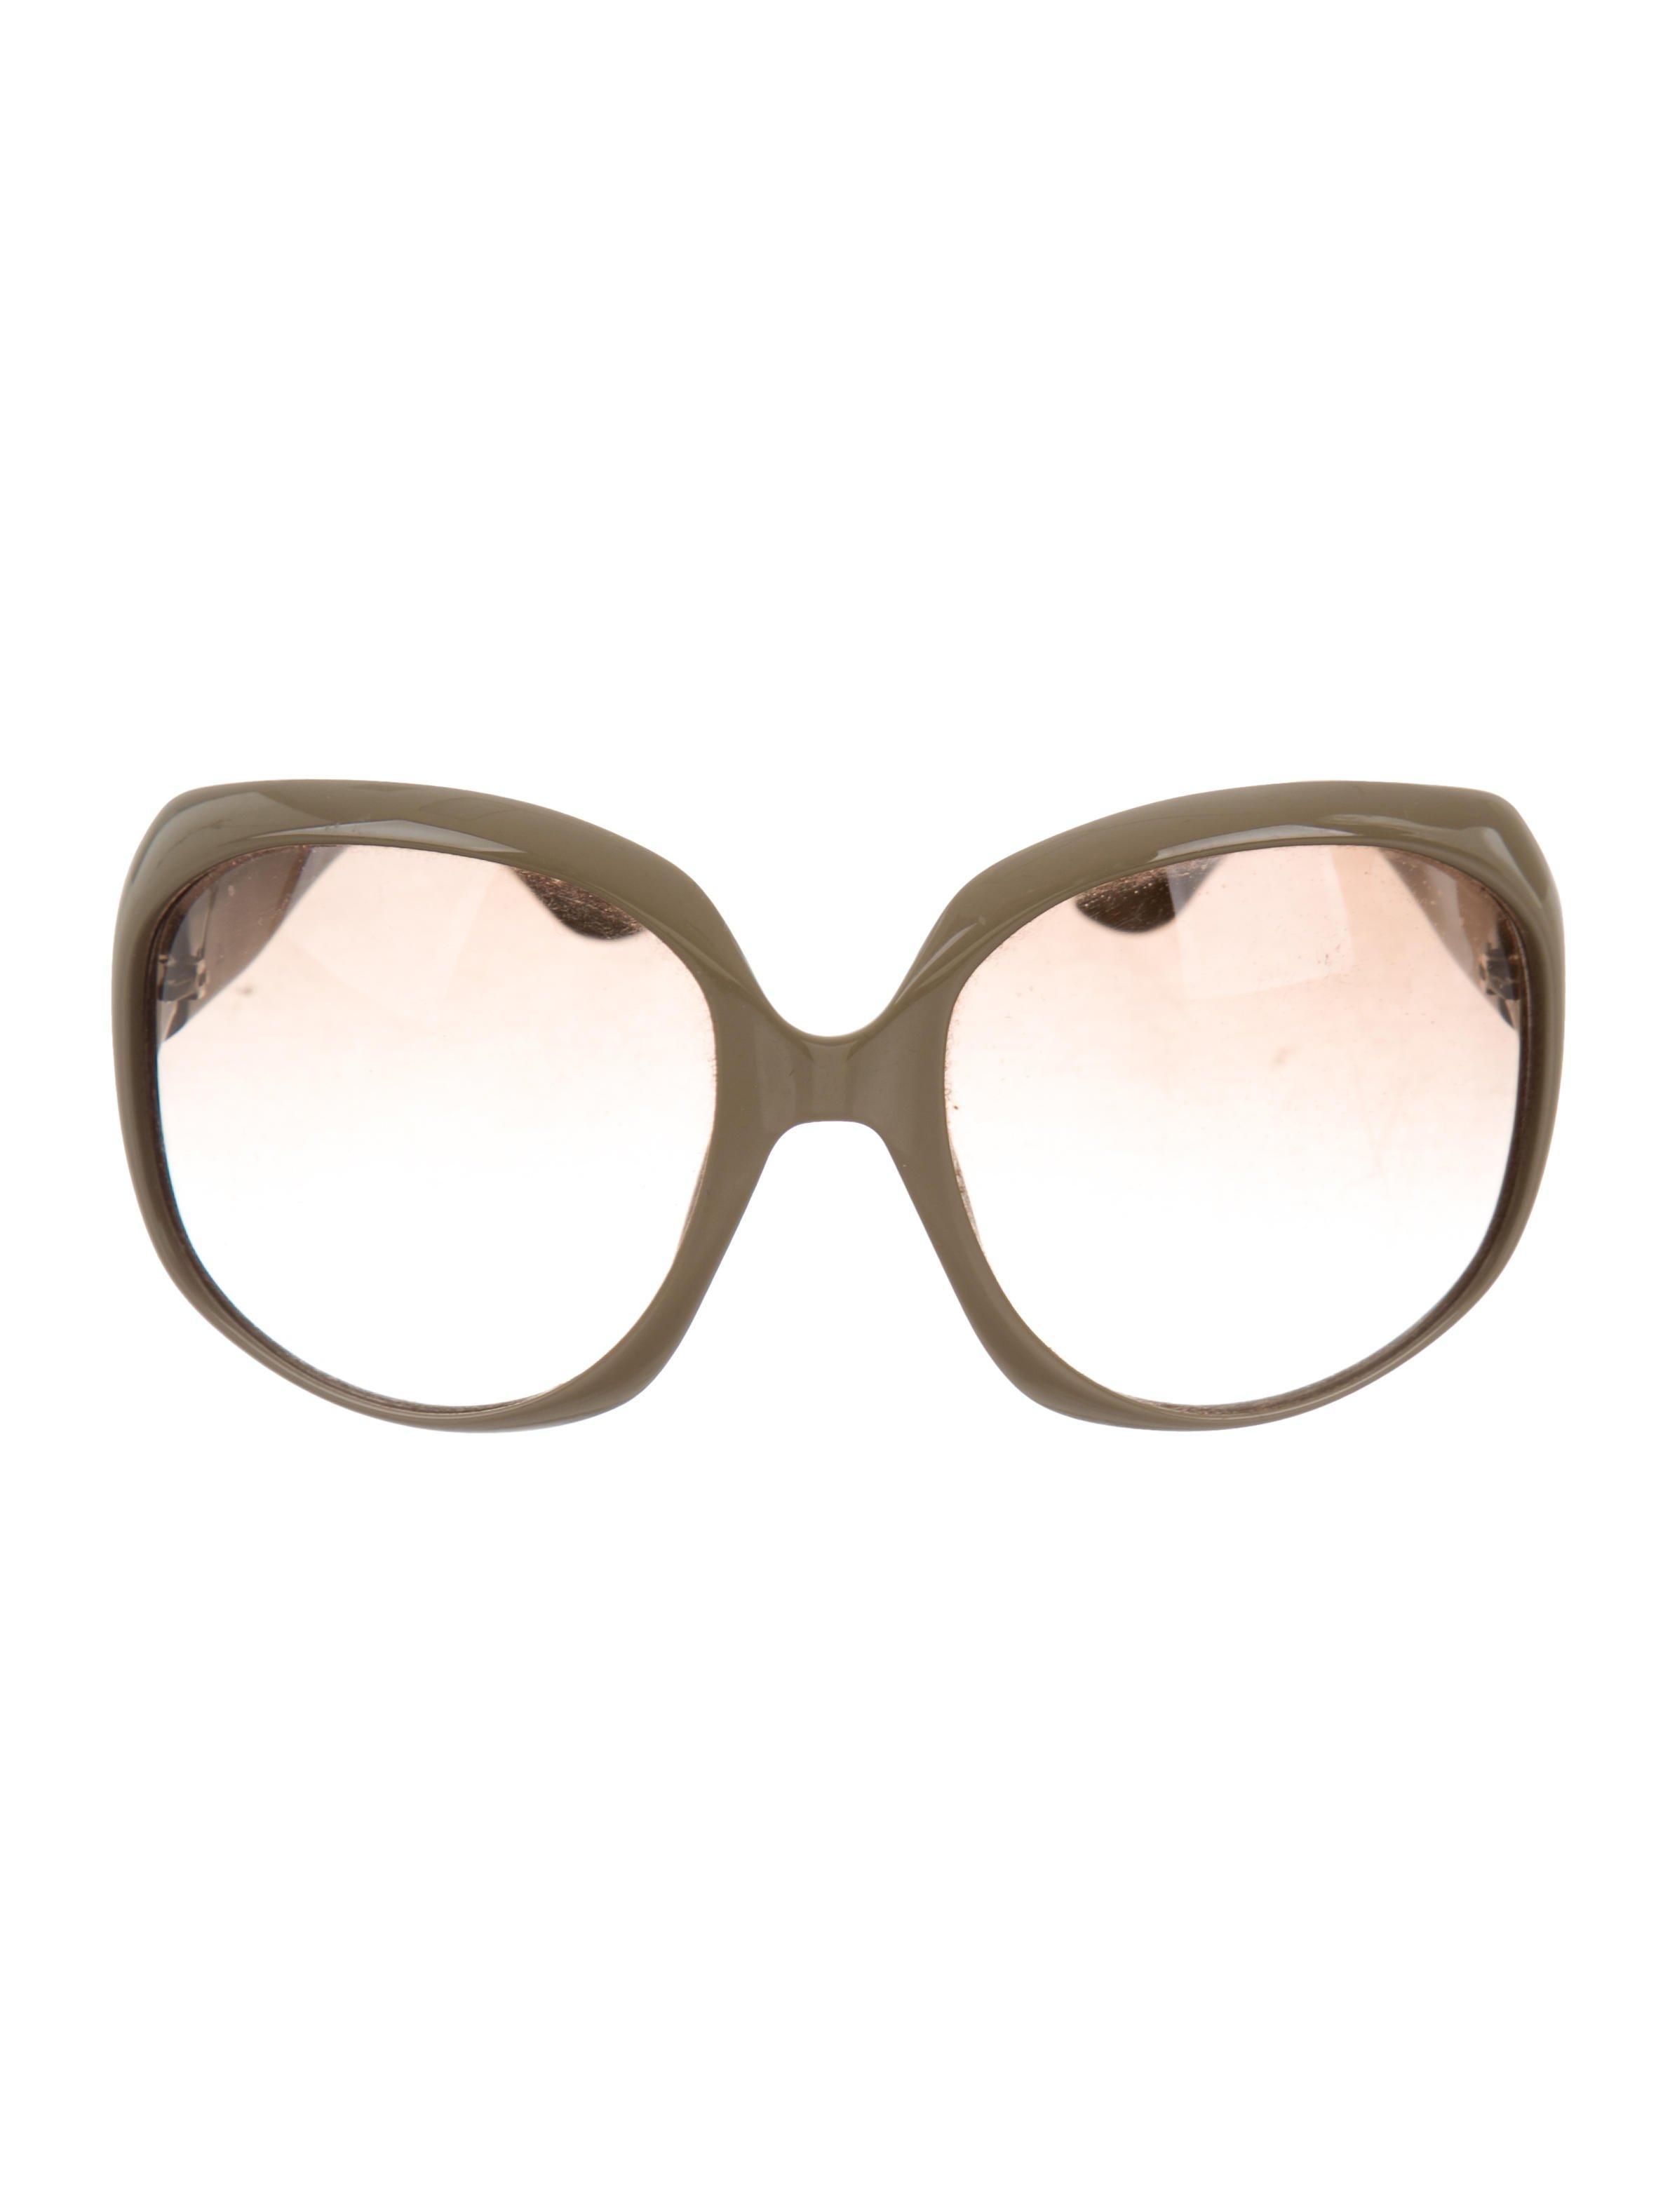 834f7f631d4 Lyst - Dior Glossy 1 Sunglasses Brown in Metallic